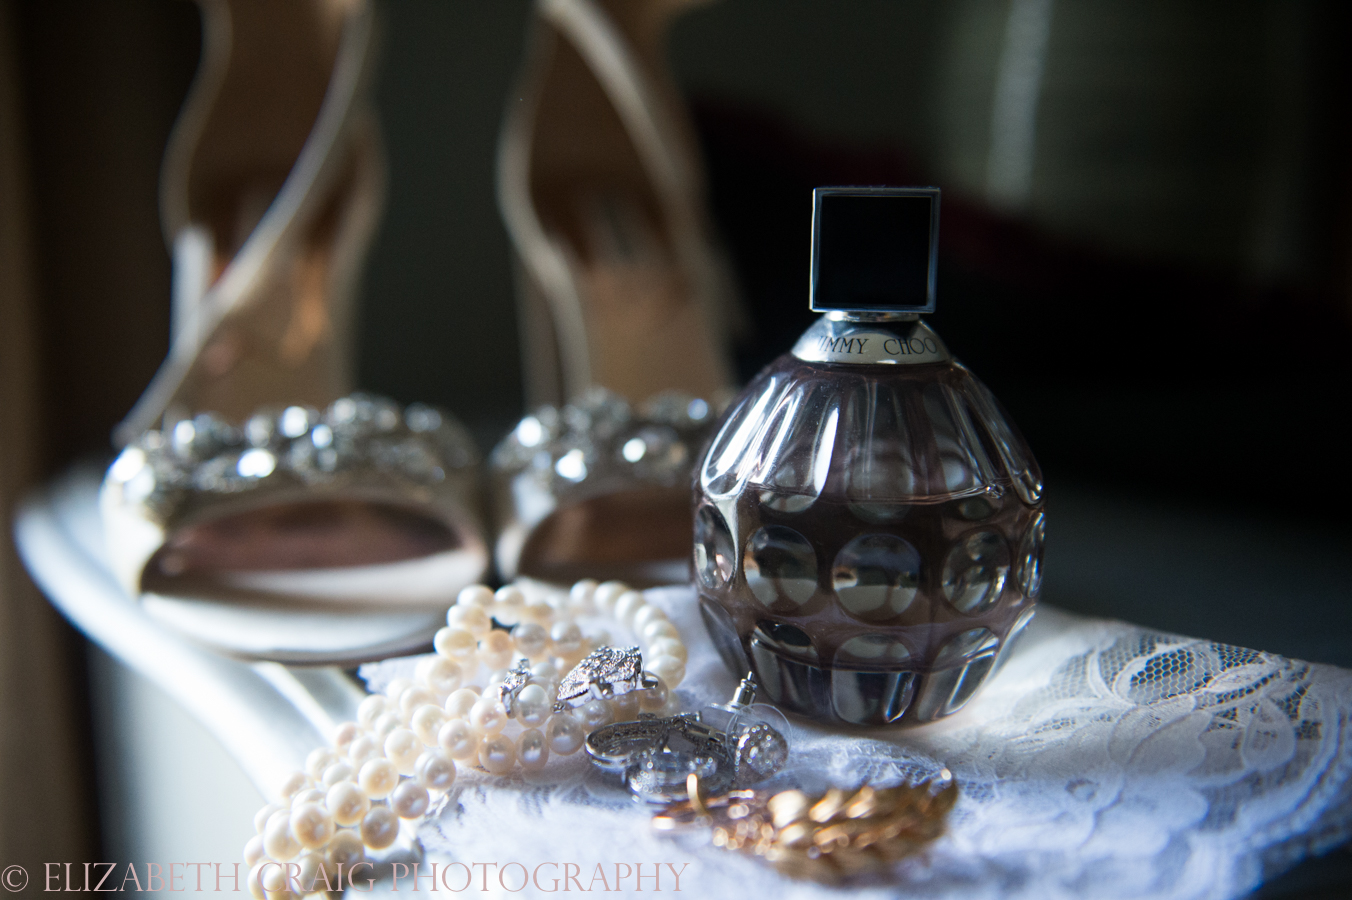 pittsburgh-greek-weddings-fairmont-weddings-receptions-elizabeth-craig-photohgraphy-003